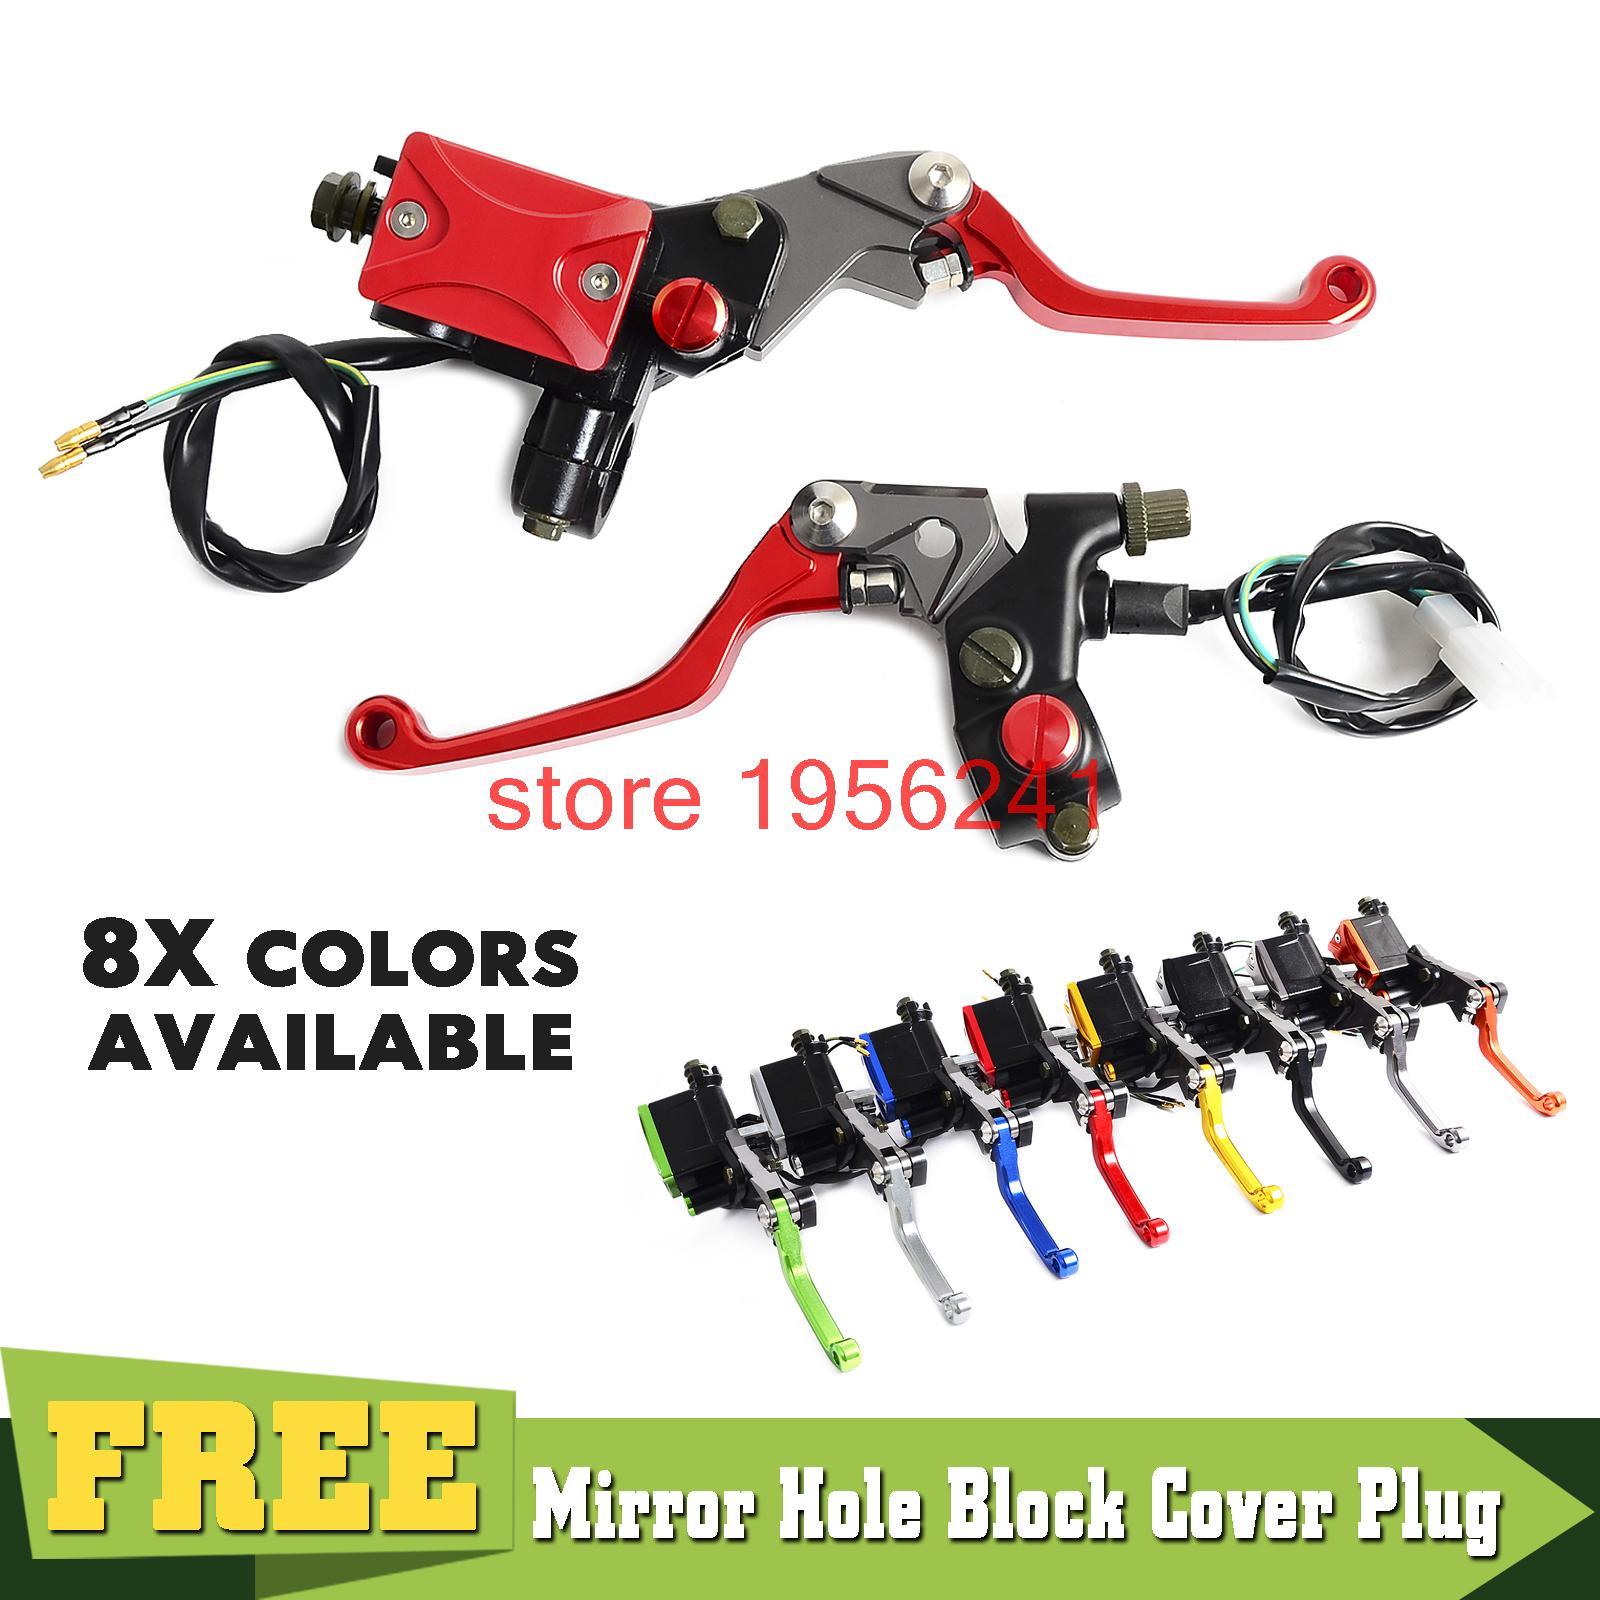 Universal Standard 7/8 Front Brake Master Cylinder Reservoir Levers For Suzuki RM85 RMZ250 RMZ450 LTZ400 LTZ450 DRZ400 DR250<br>